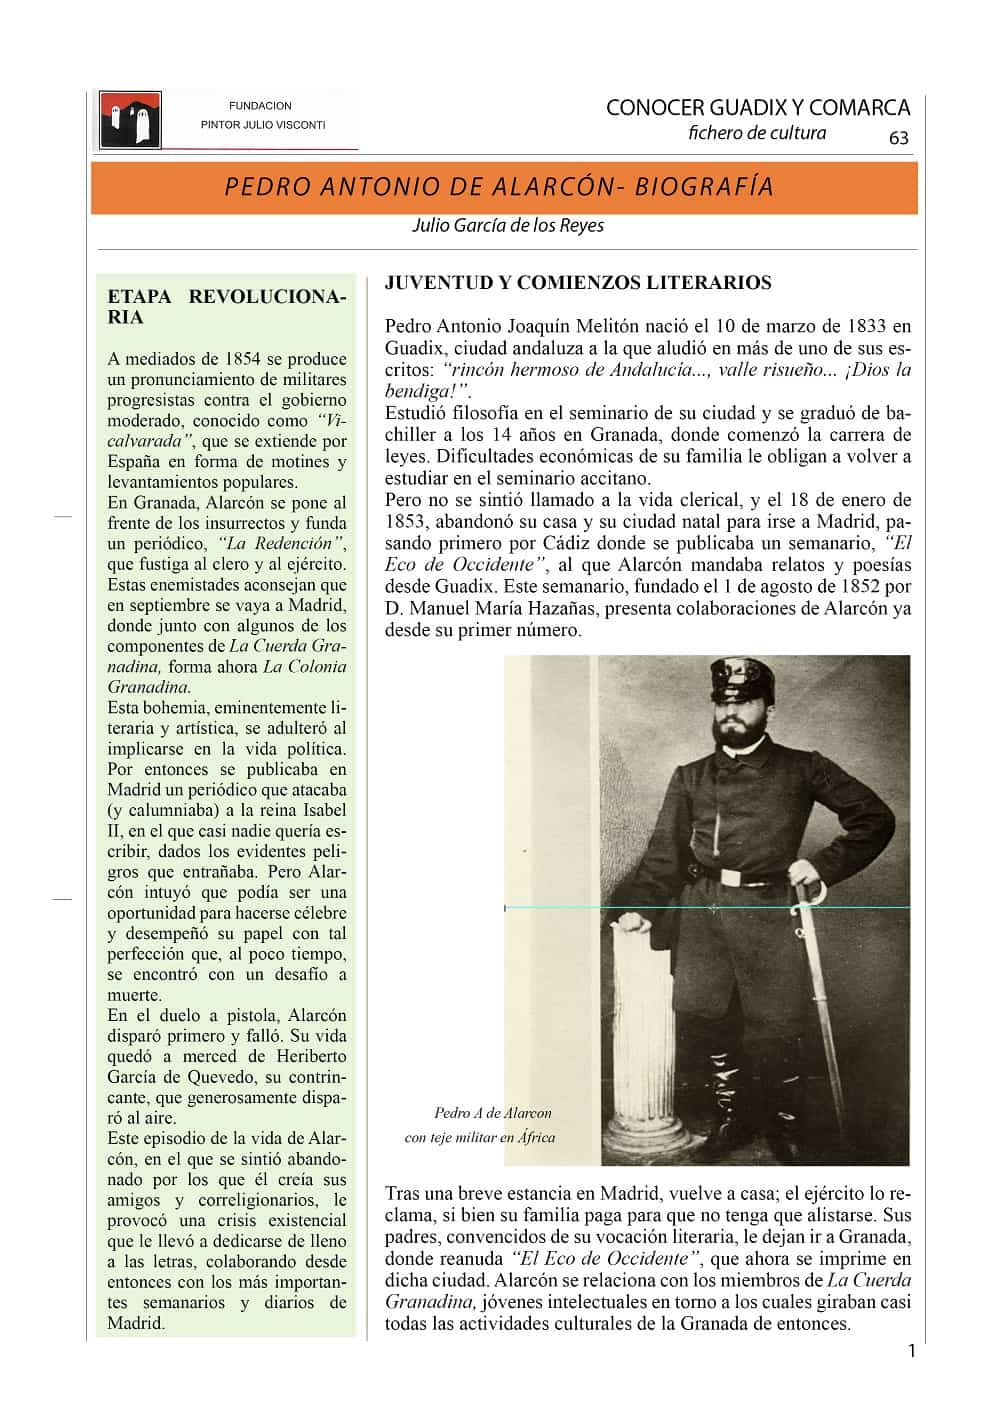 Pedro A de Alarcón, biografía 1-min